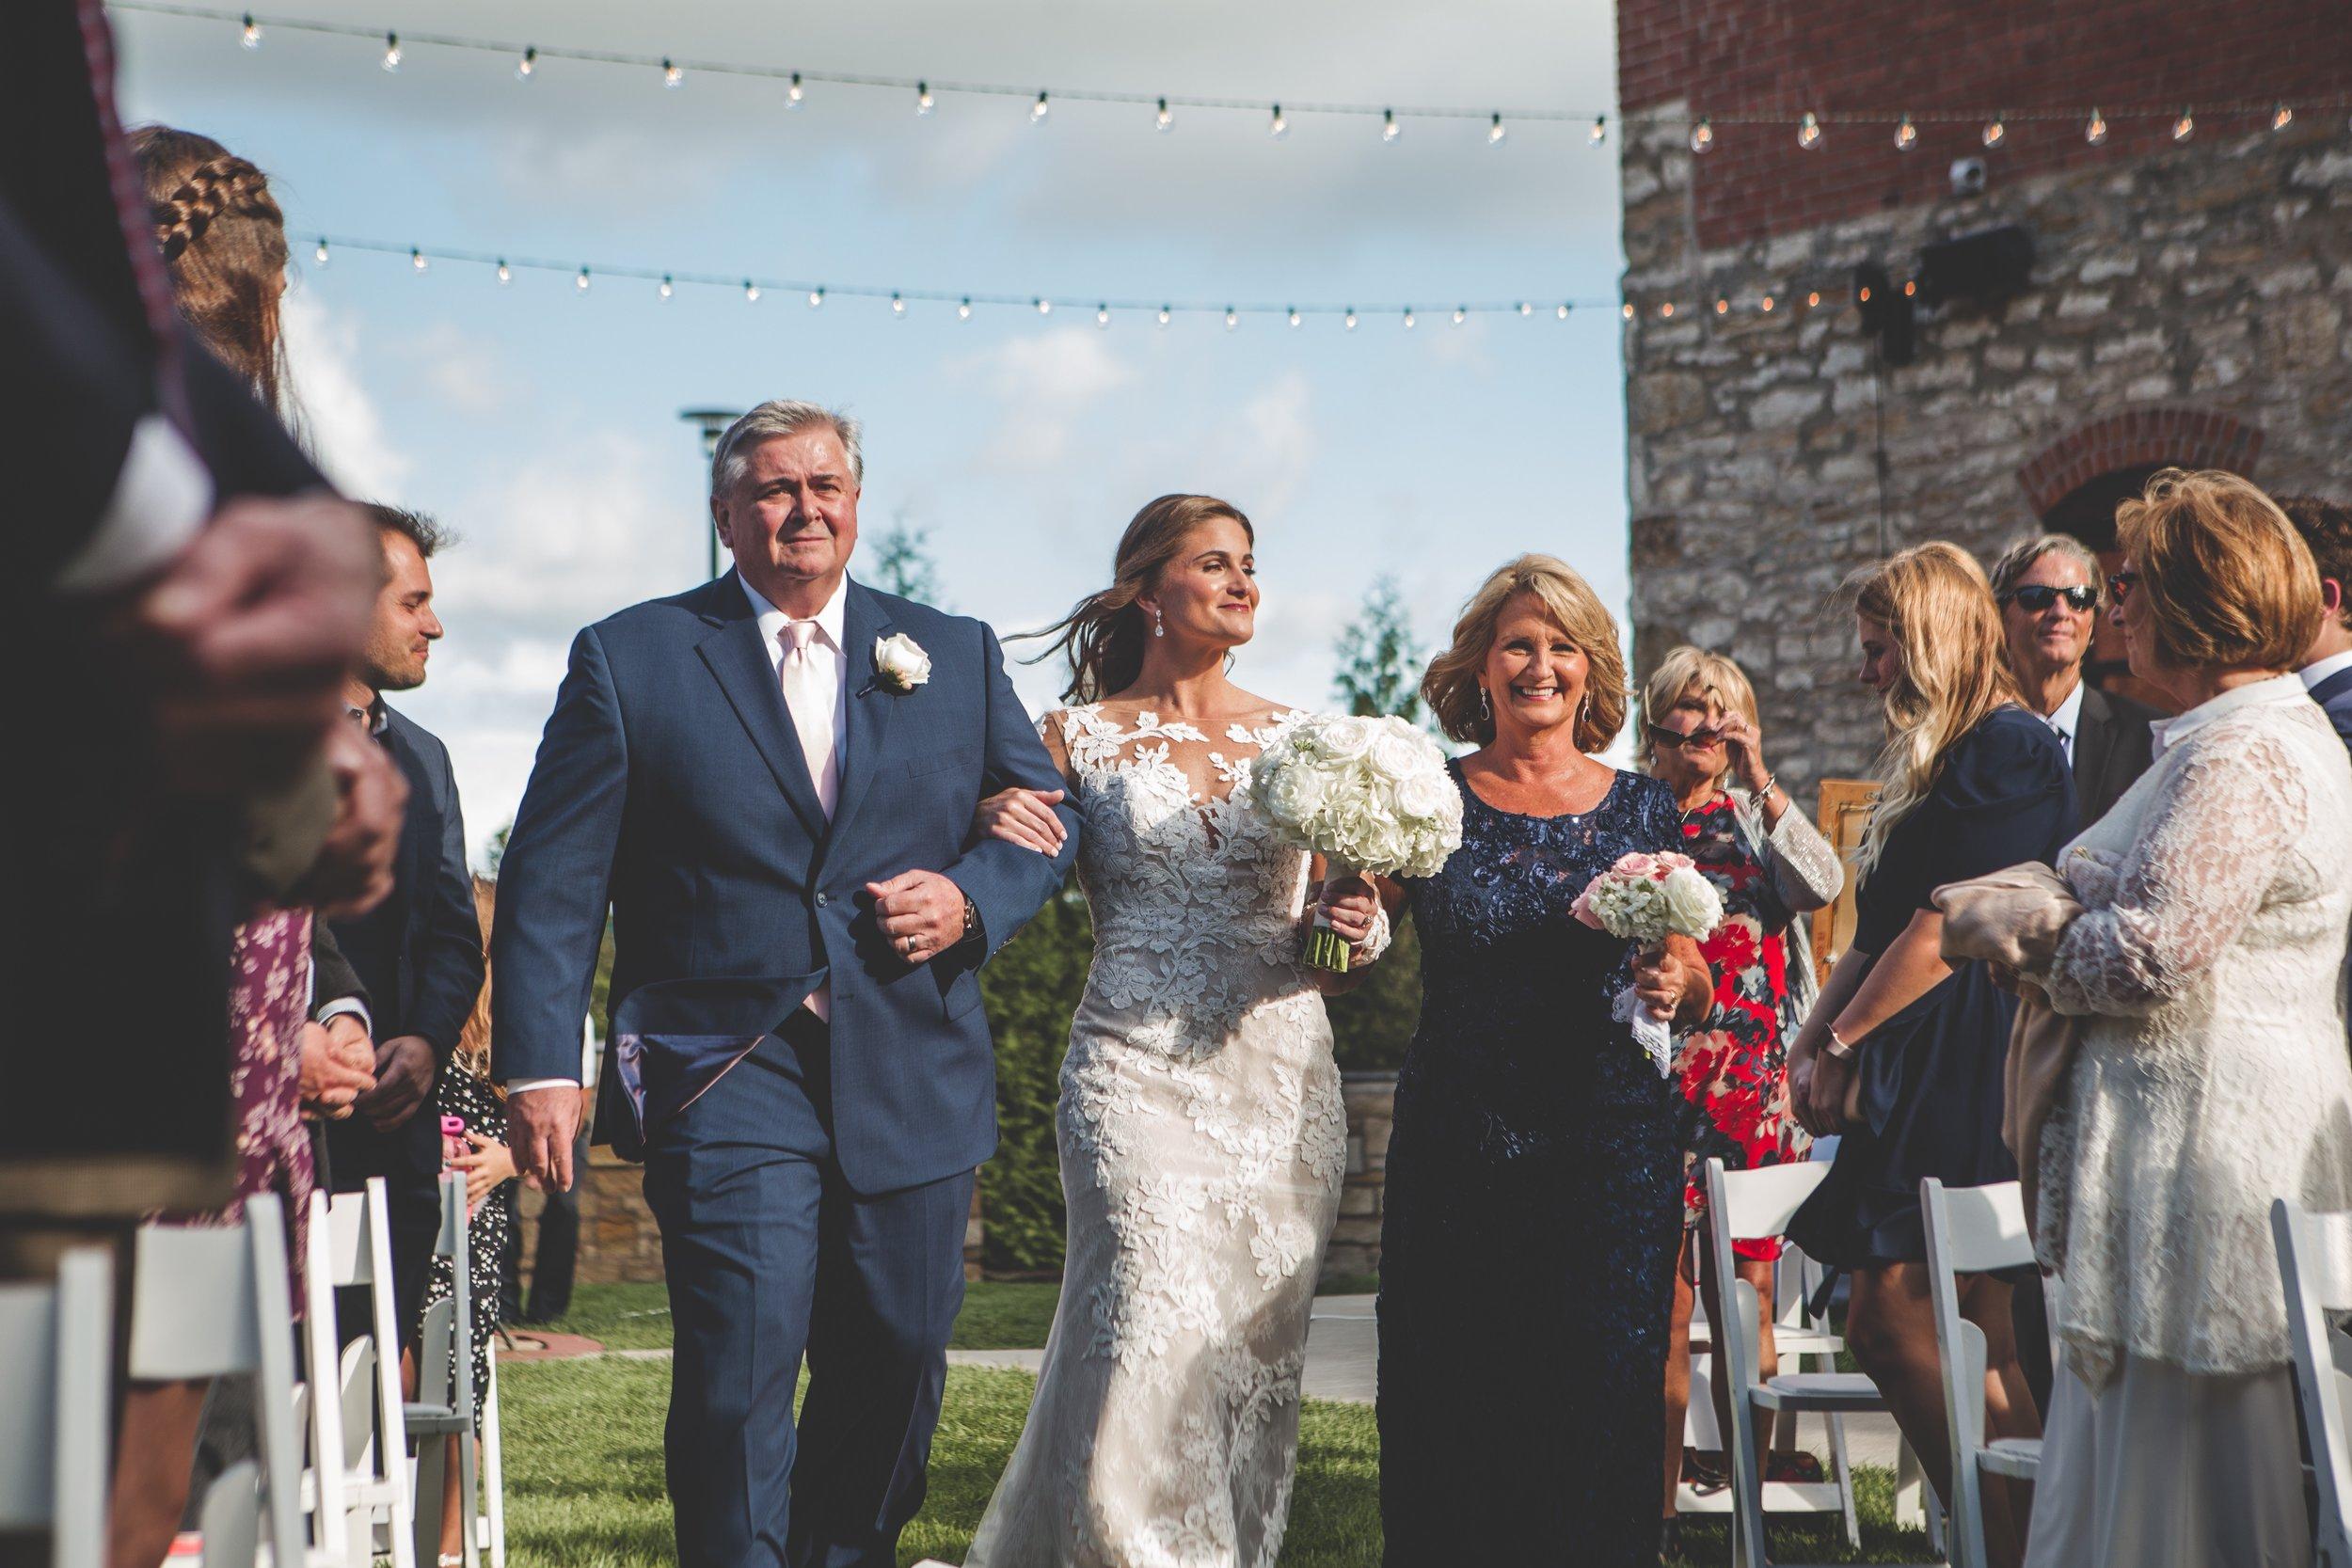 cider-gallery-lawrence-ks-wedding-photographer-jason-domingues-photography-lindsey-paul-0367.jpg